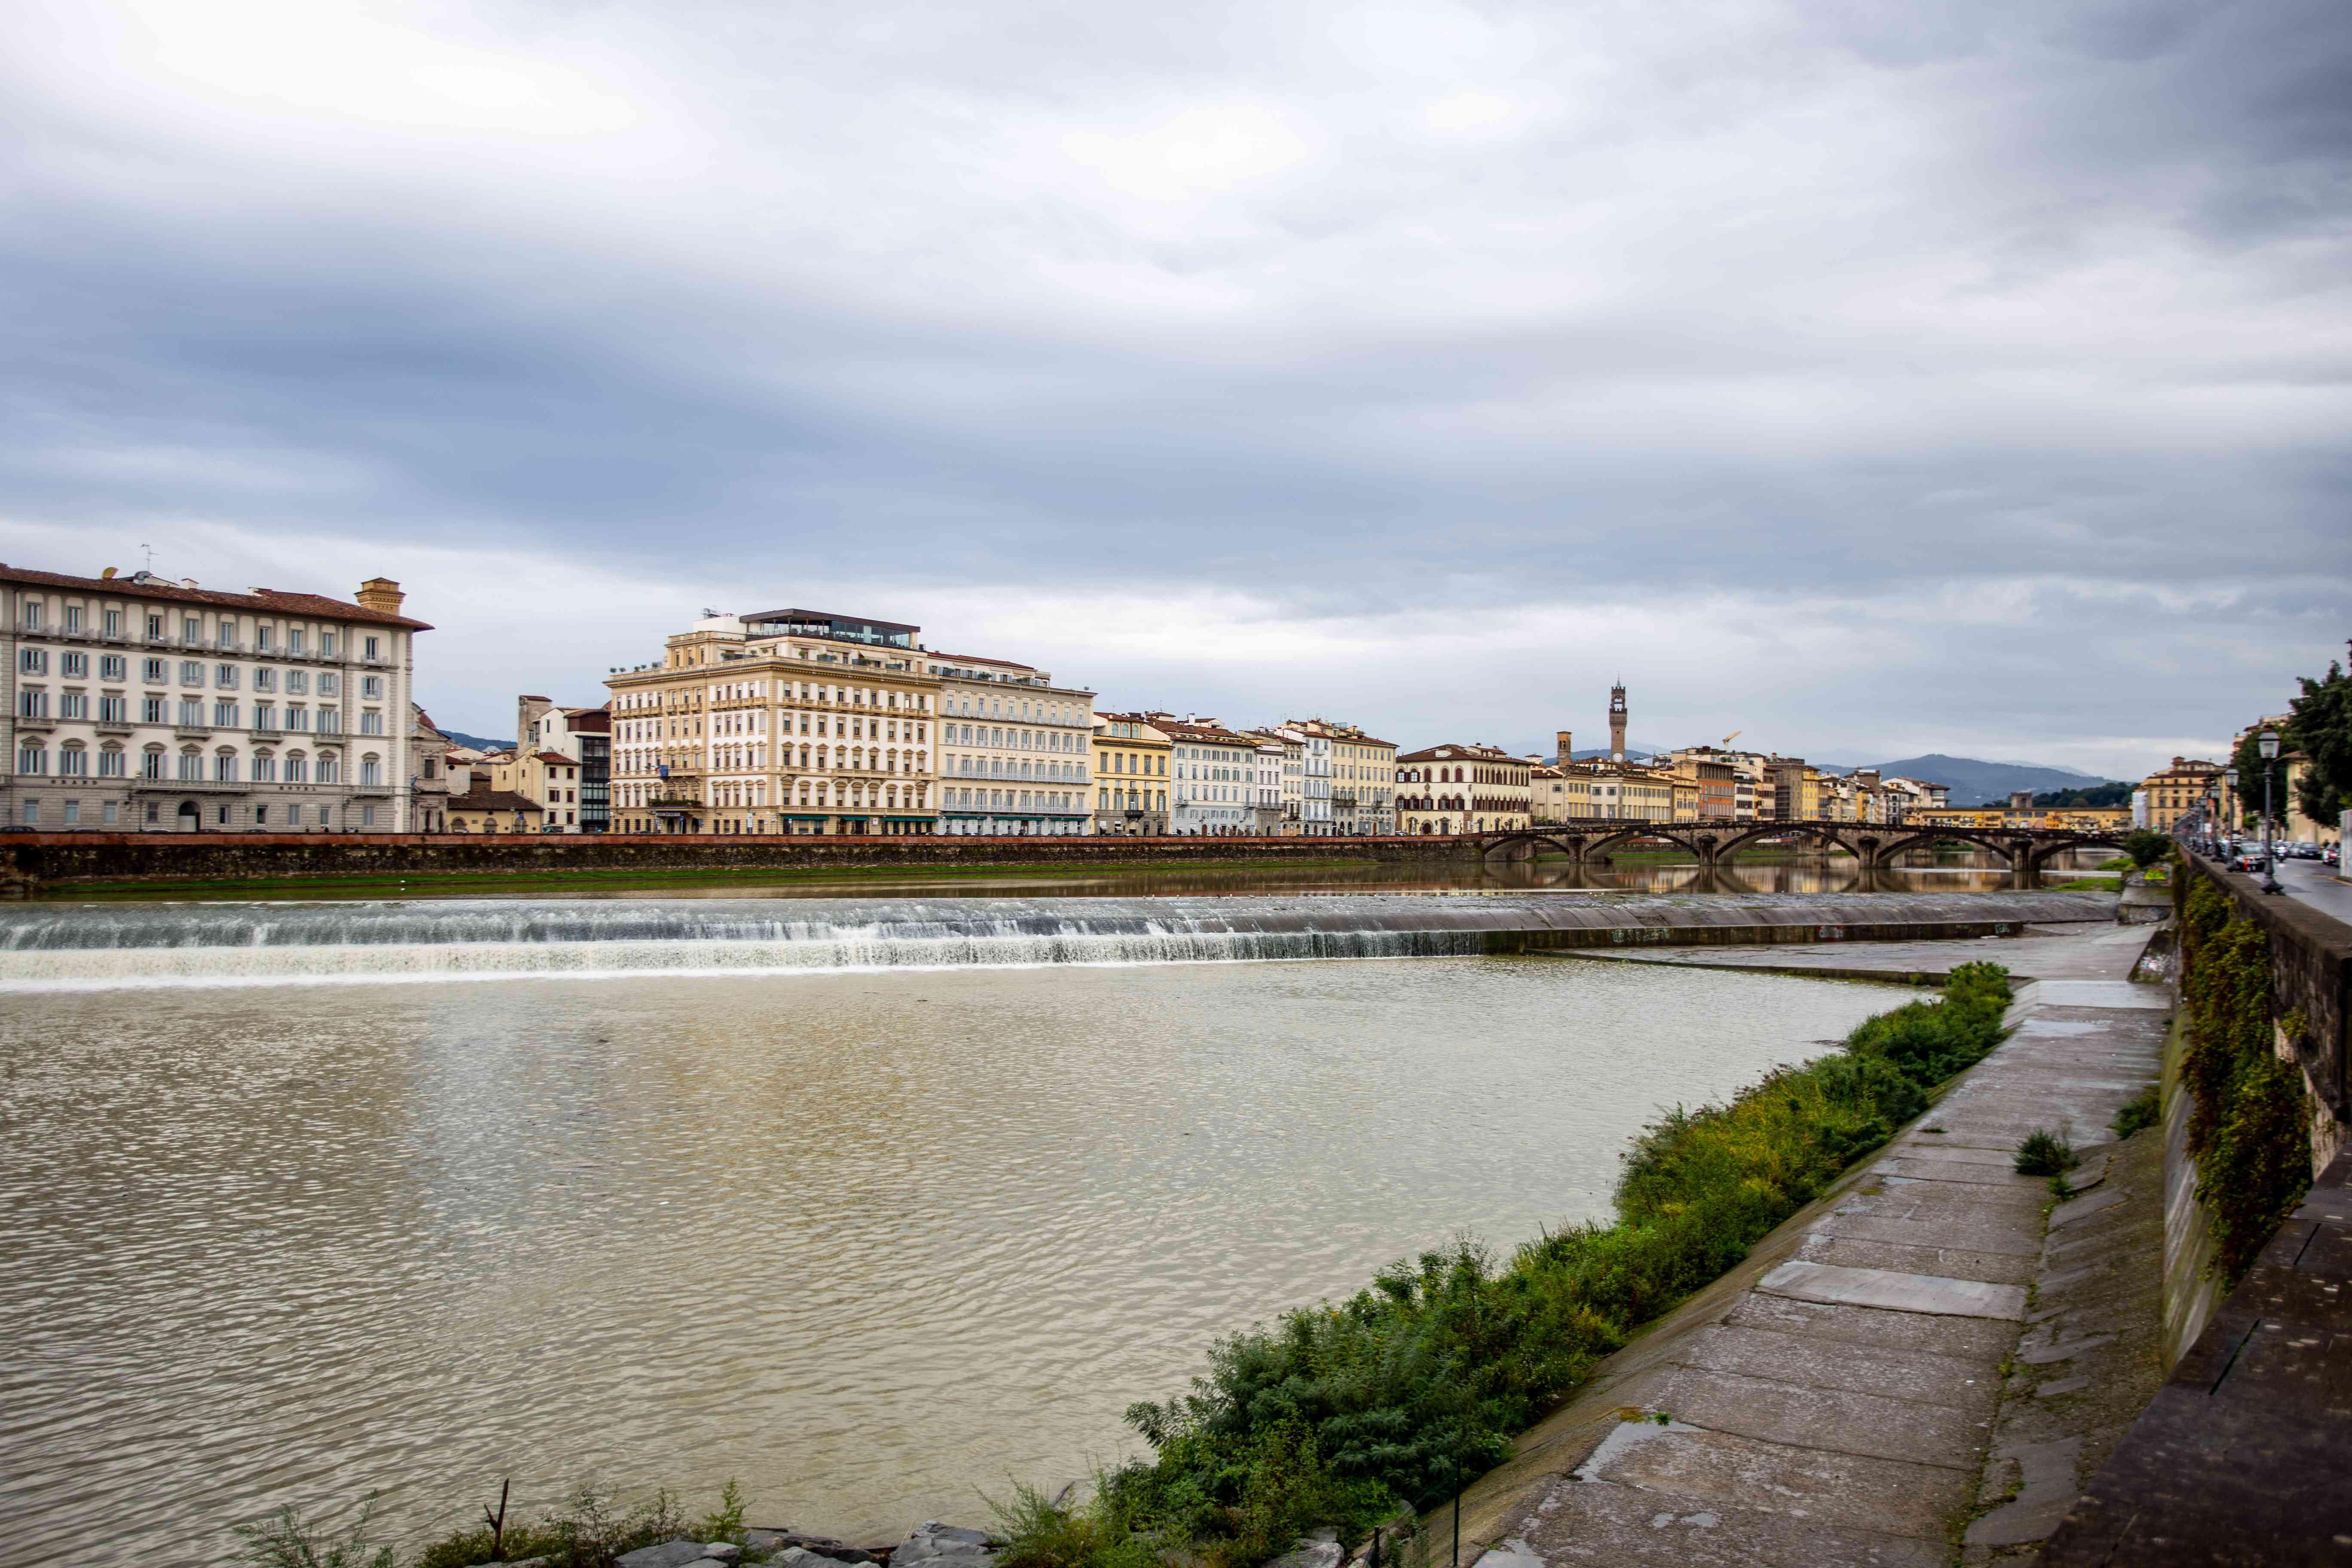 San Freddiano, Florence, Italy